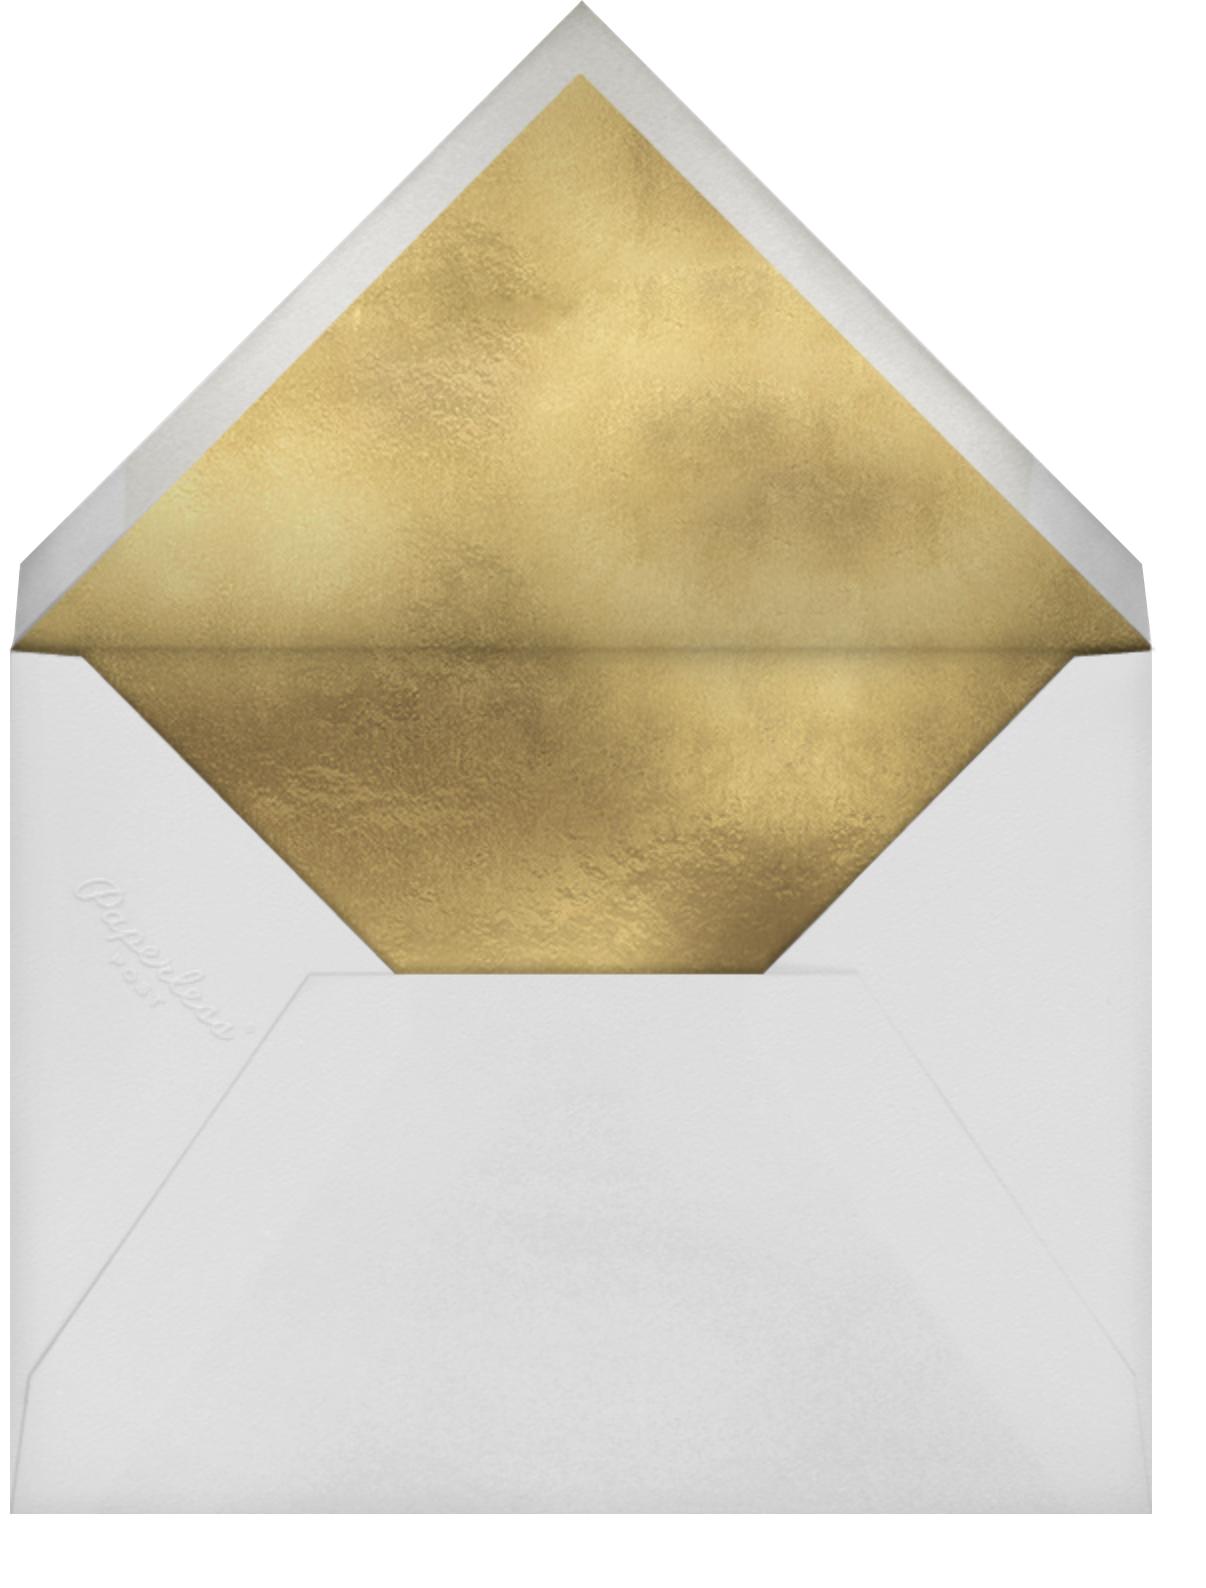 Better Daisies (Invitation) - Caviar - Mr. Boddington's Studio - Envelope